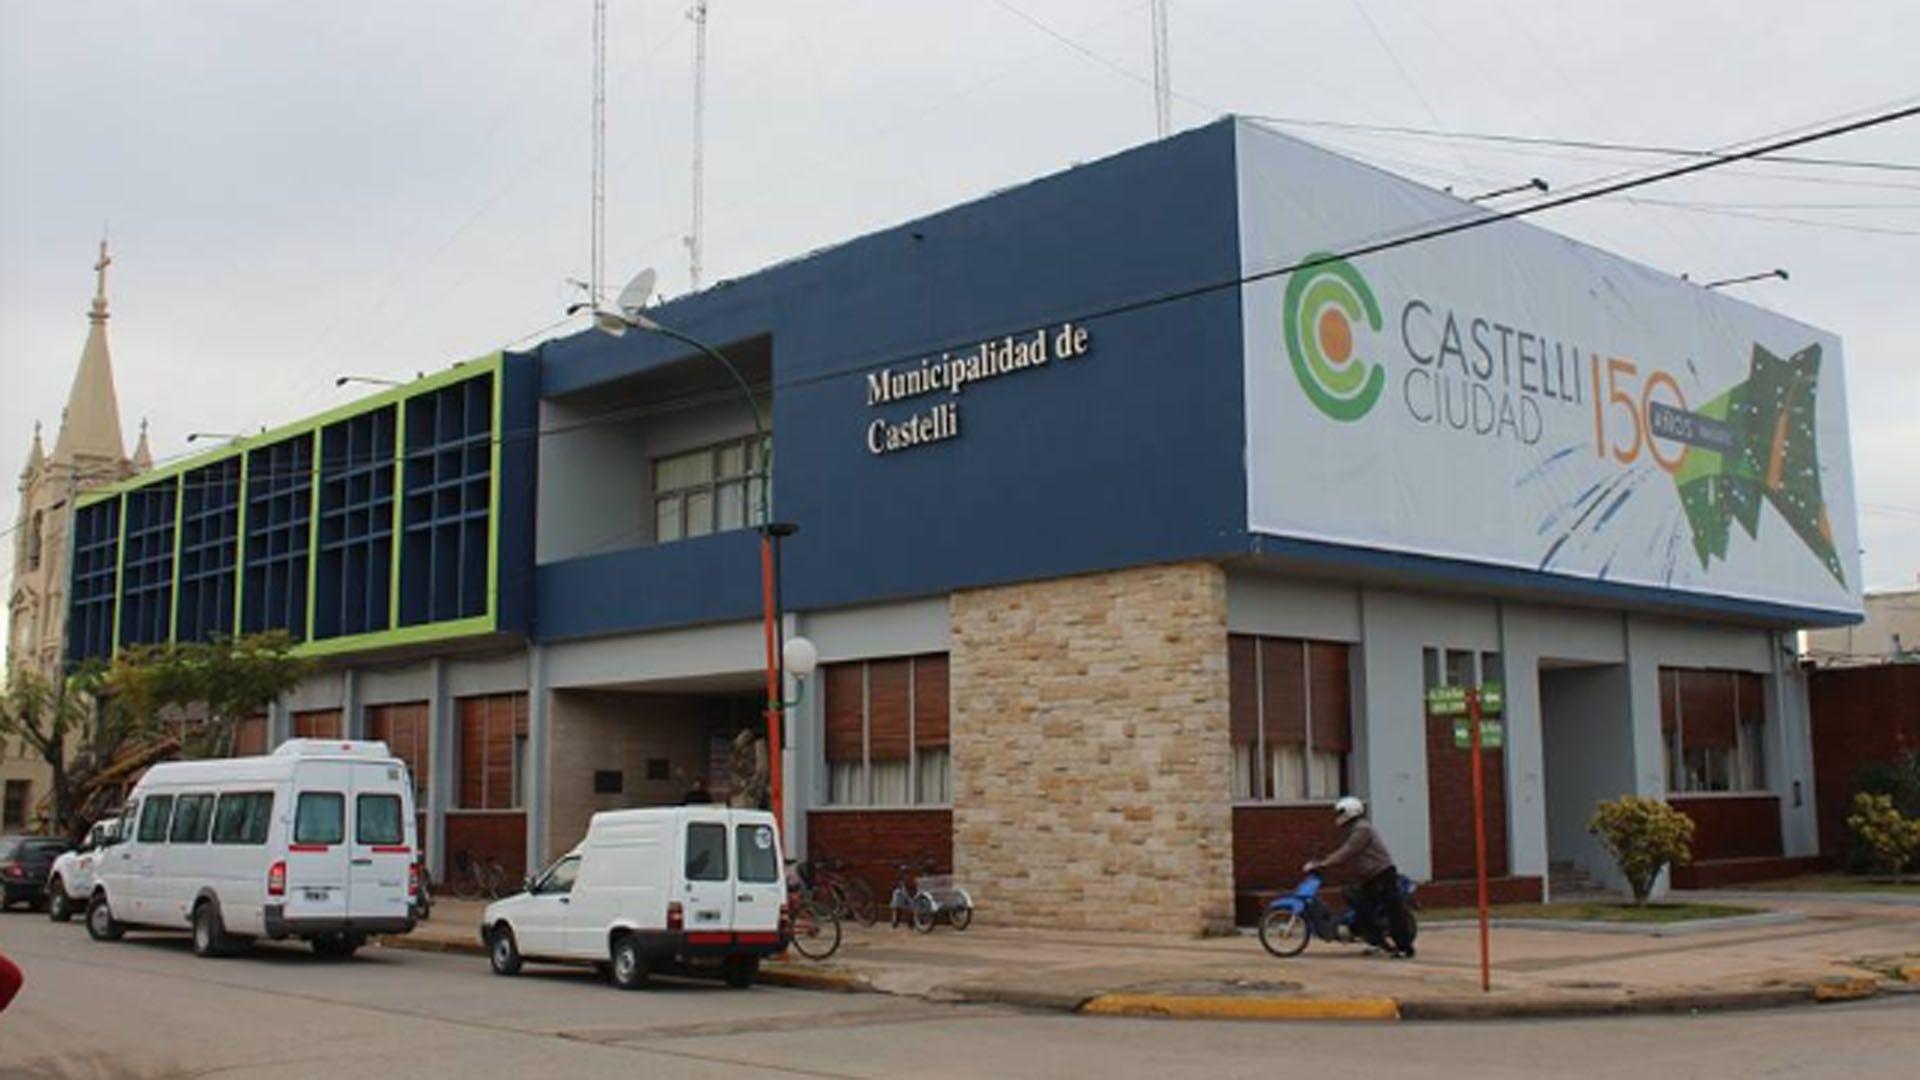 Municipalidad de Castelli